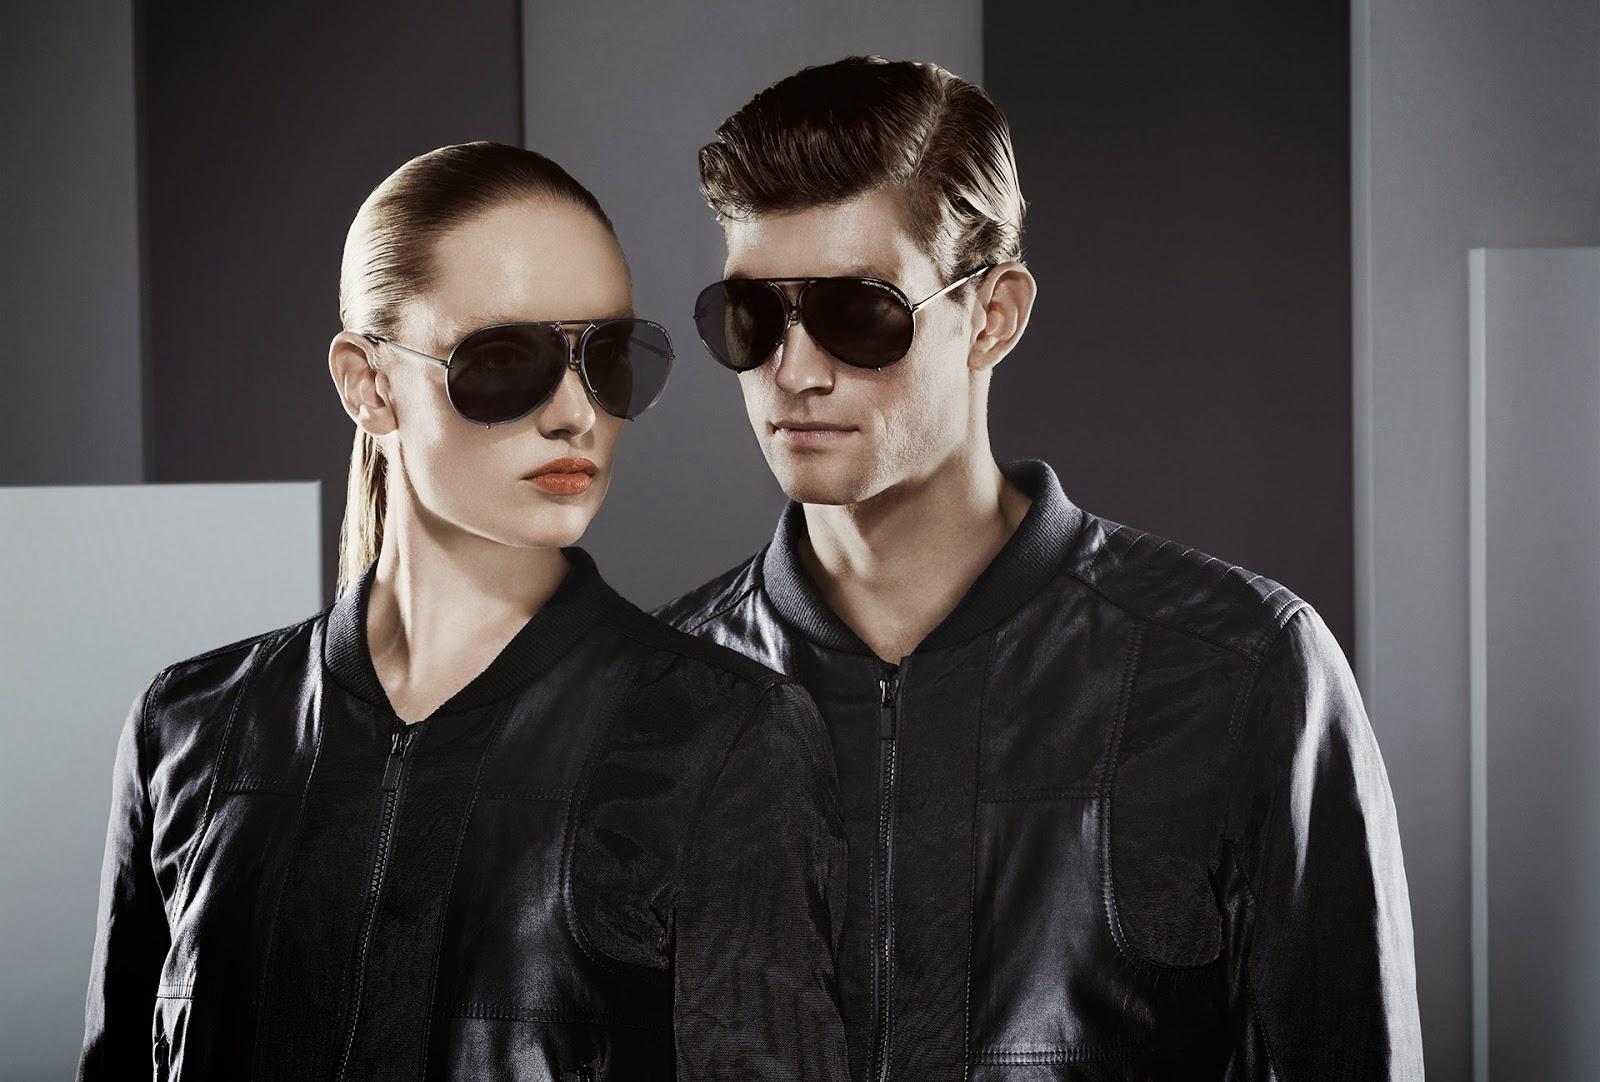 otticanet porsche design eyewear passion performance purity precision. Black Bedroom Furniture Sets. Home Design Ideas